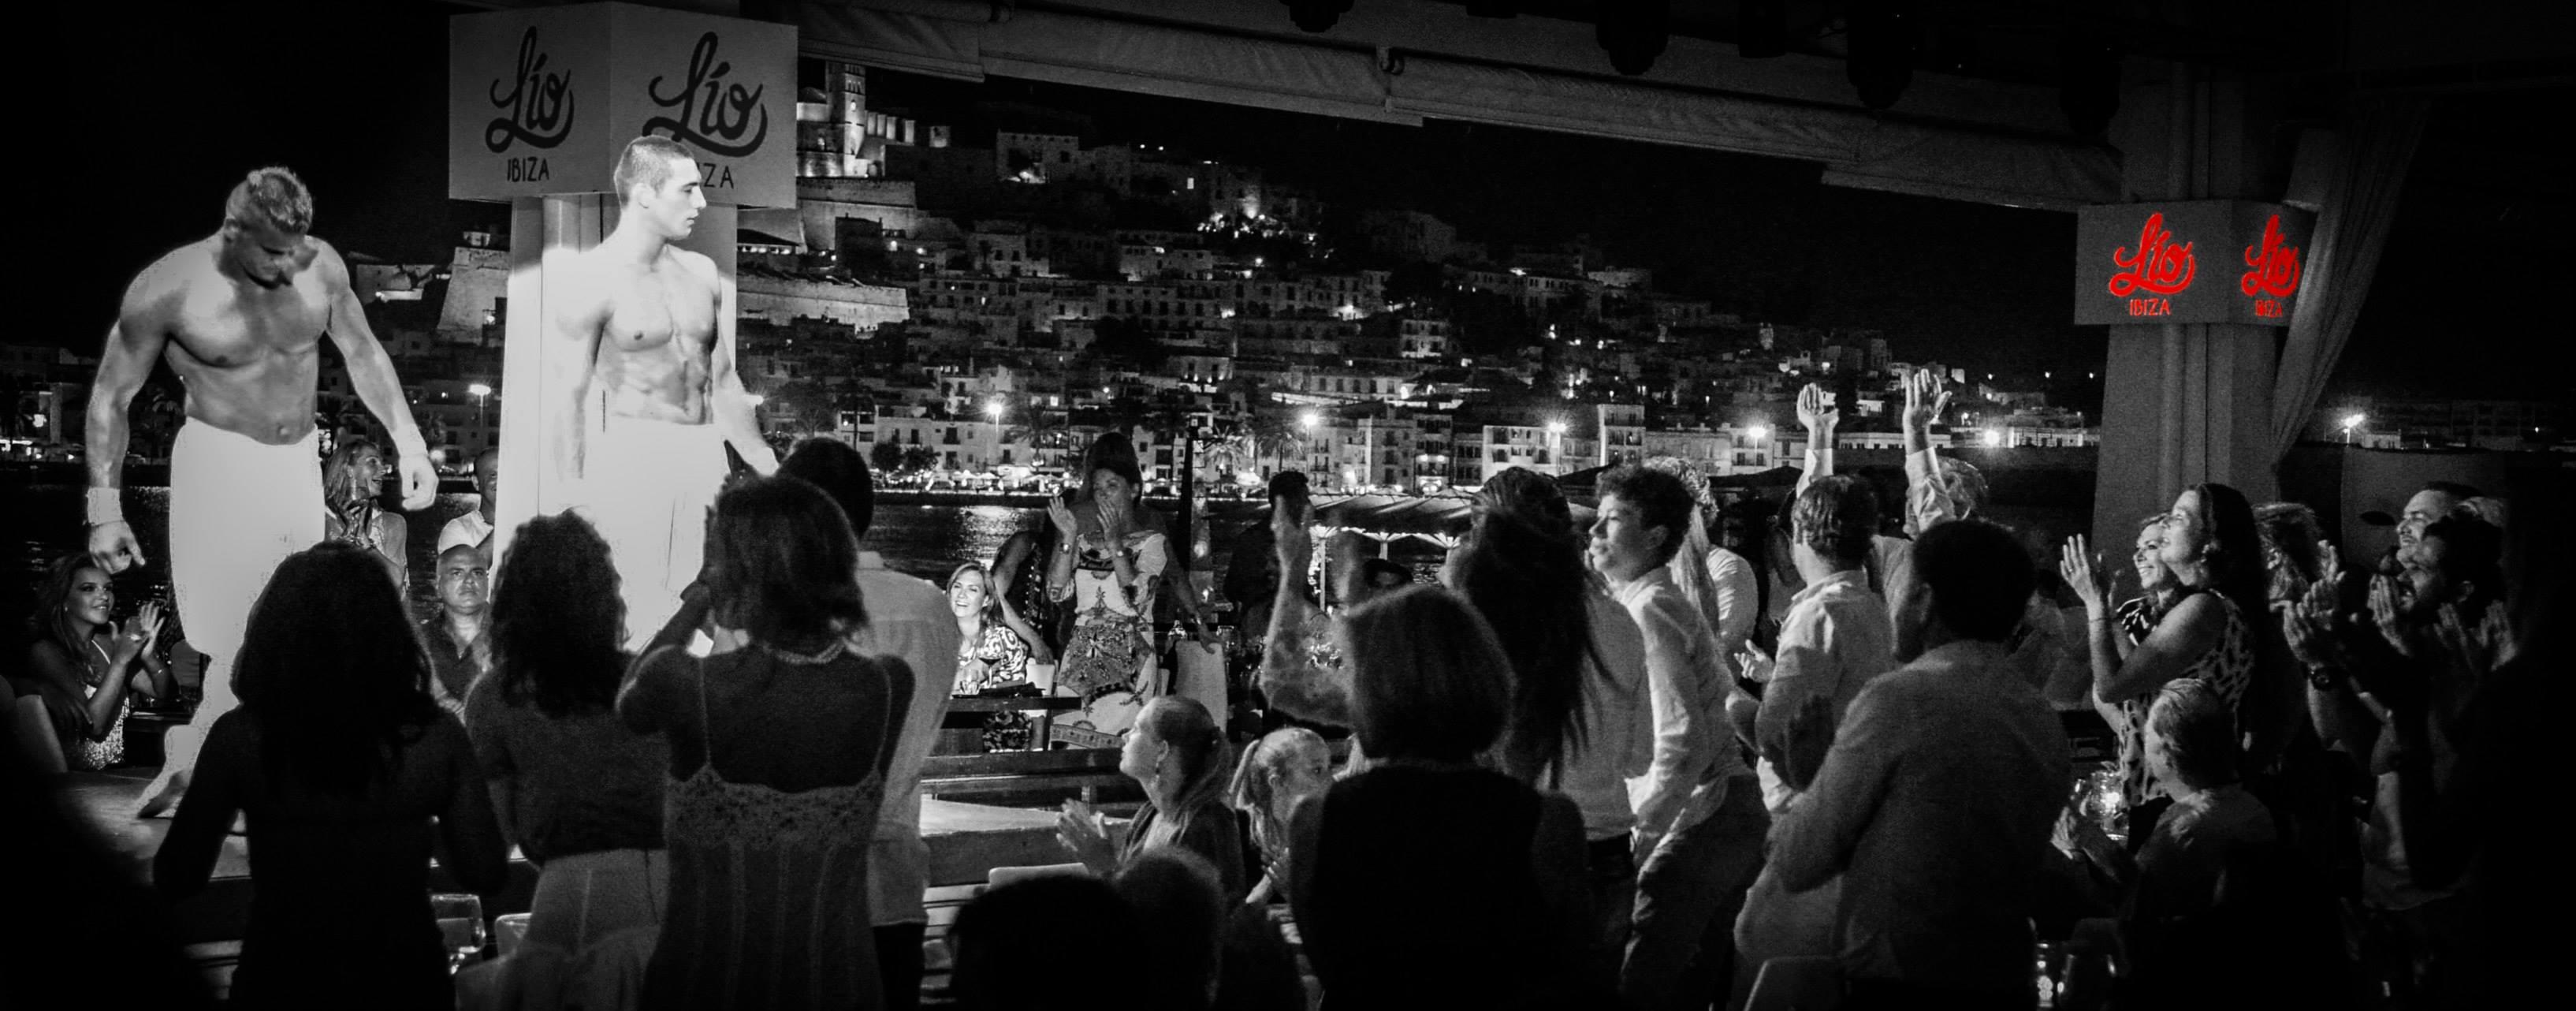 Ultimul spectacol a fost in Ibiza